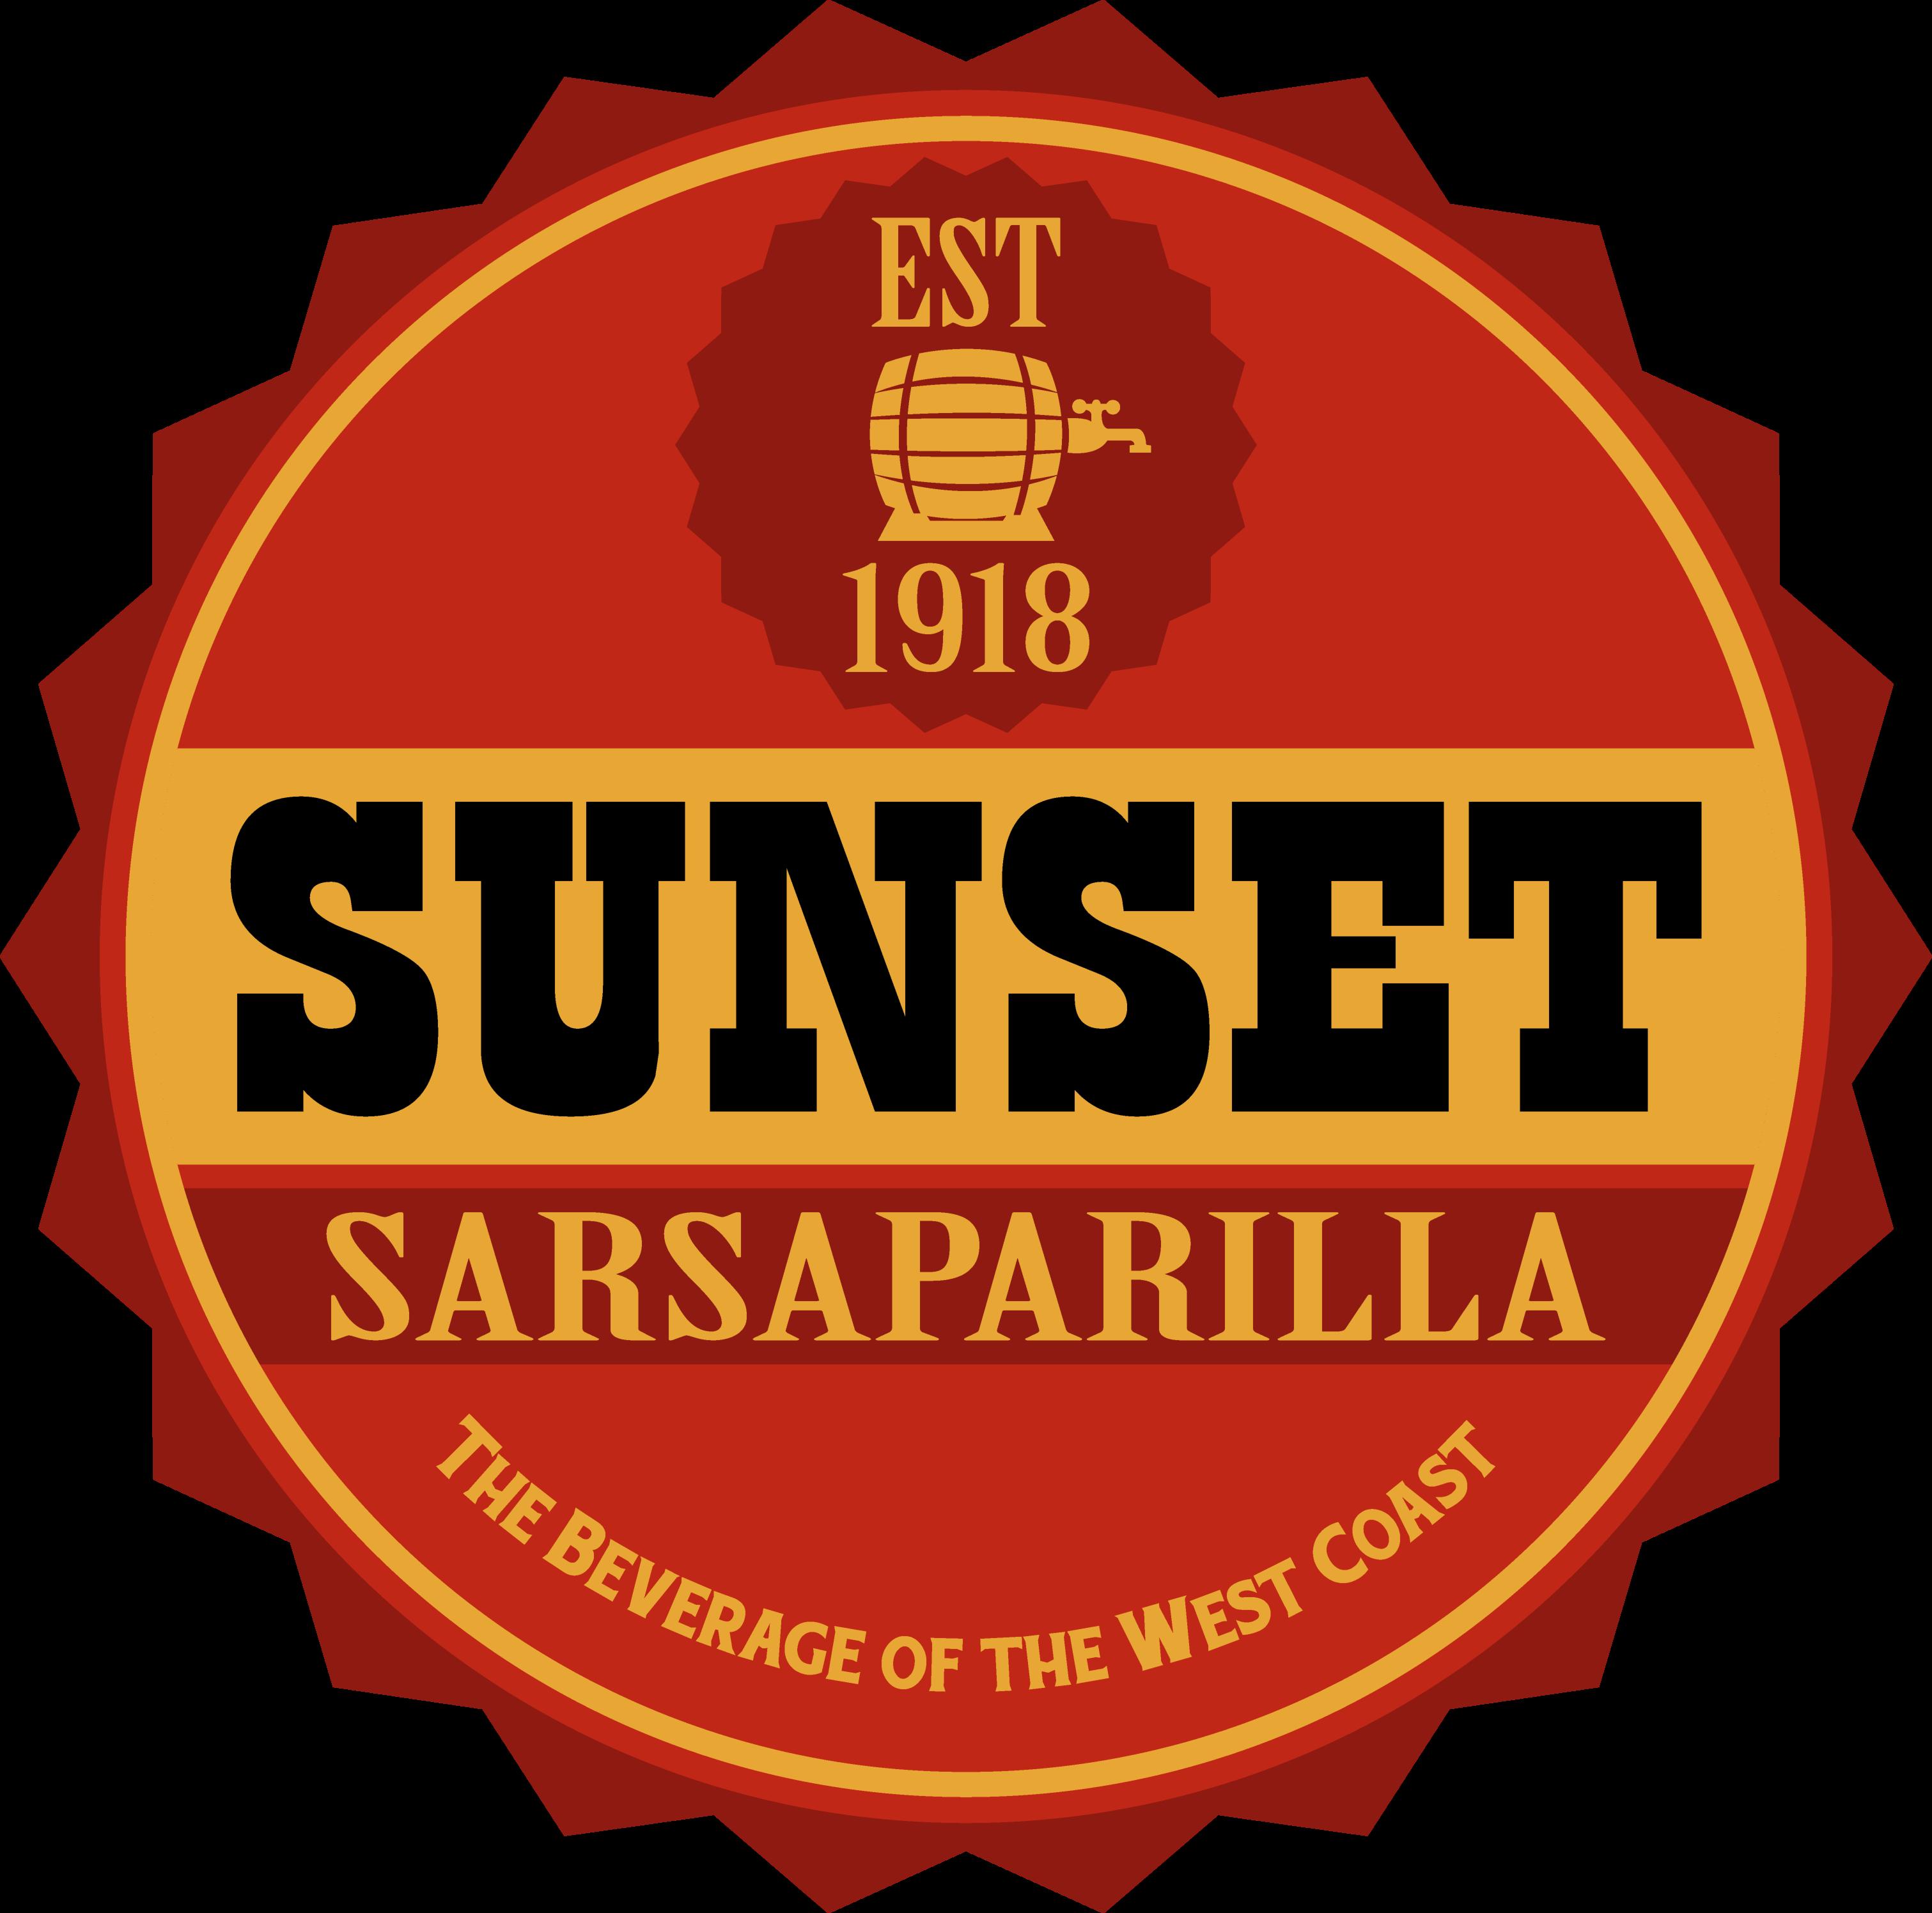 Sunsetsarsaparillacapnoedge